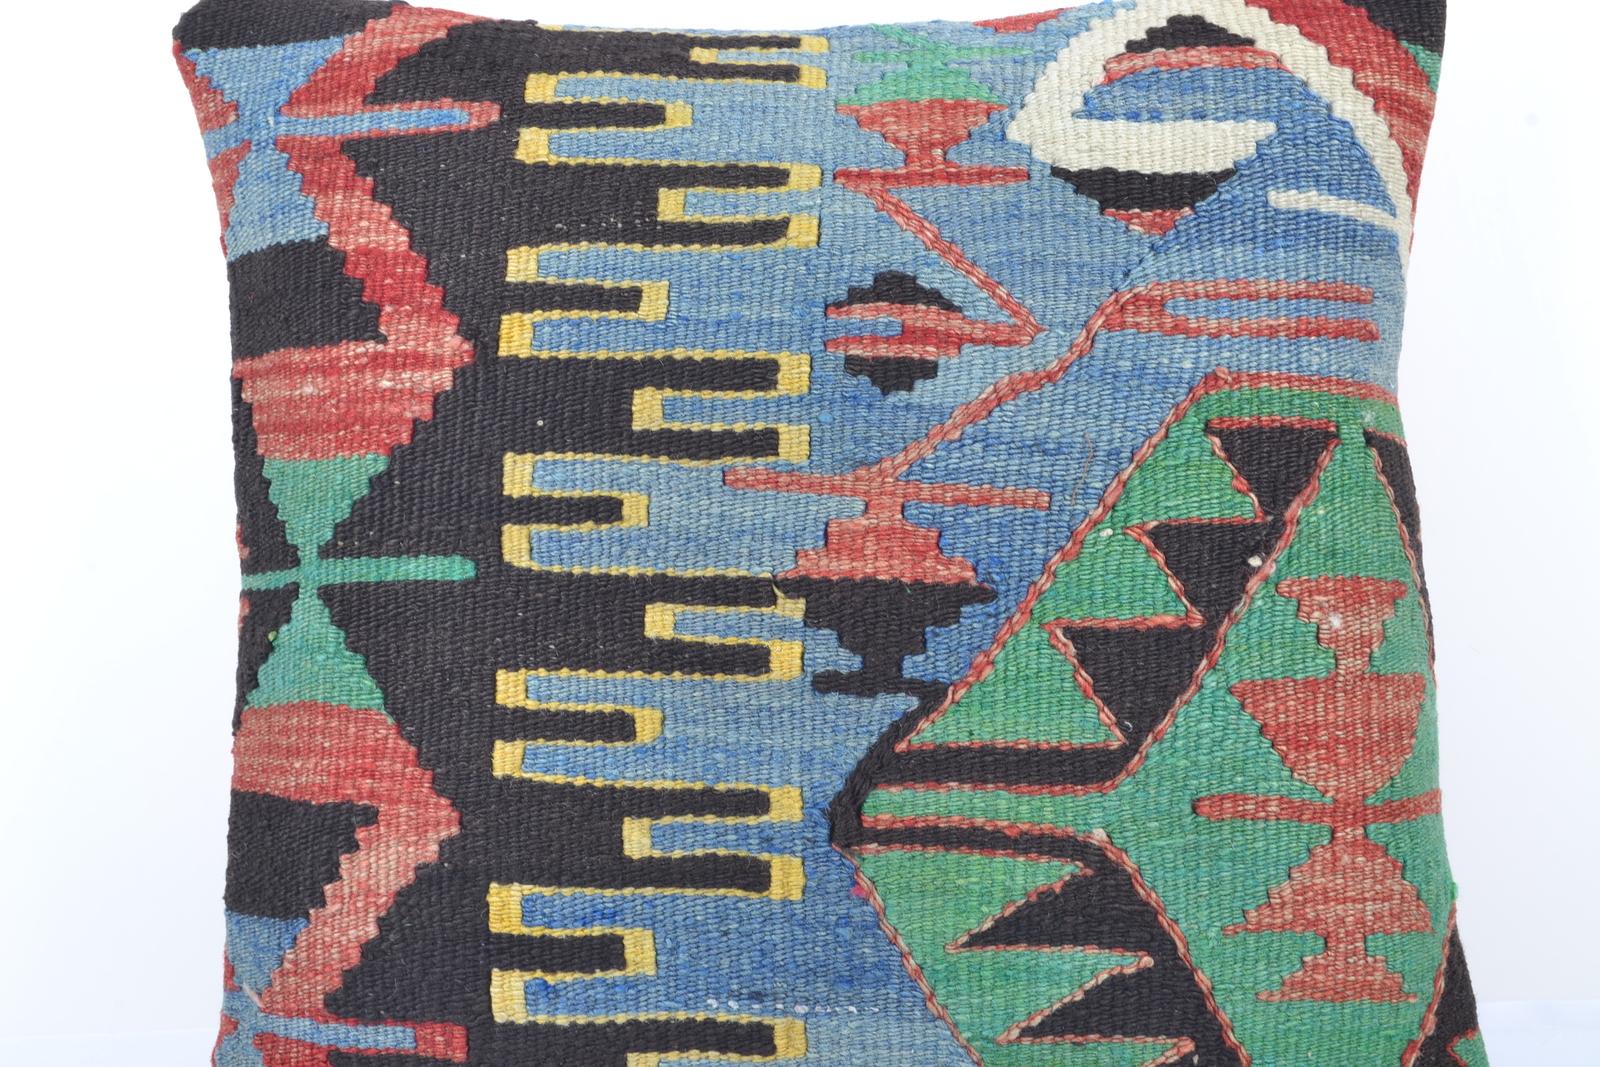 Geometric Cushion Knitting Pattern : geometric pillow,colorful knitting pillow,couch pillows,knitting patterns pil...